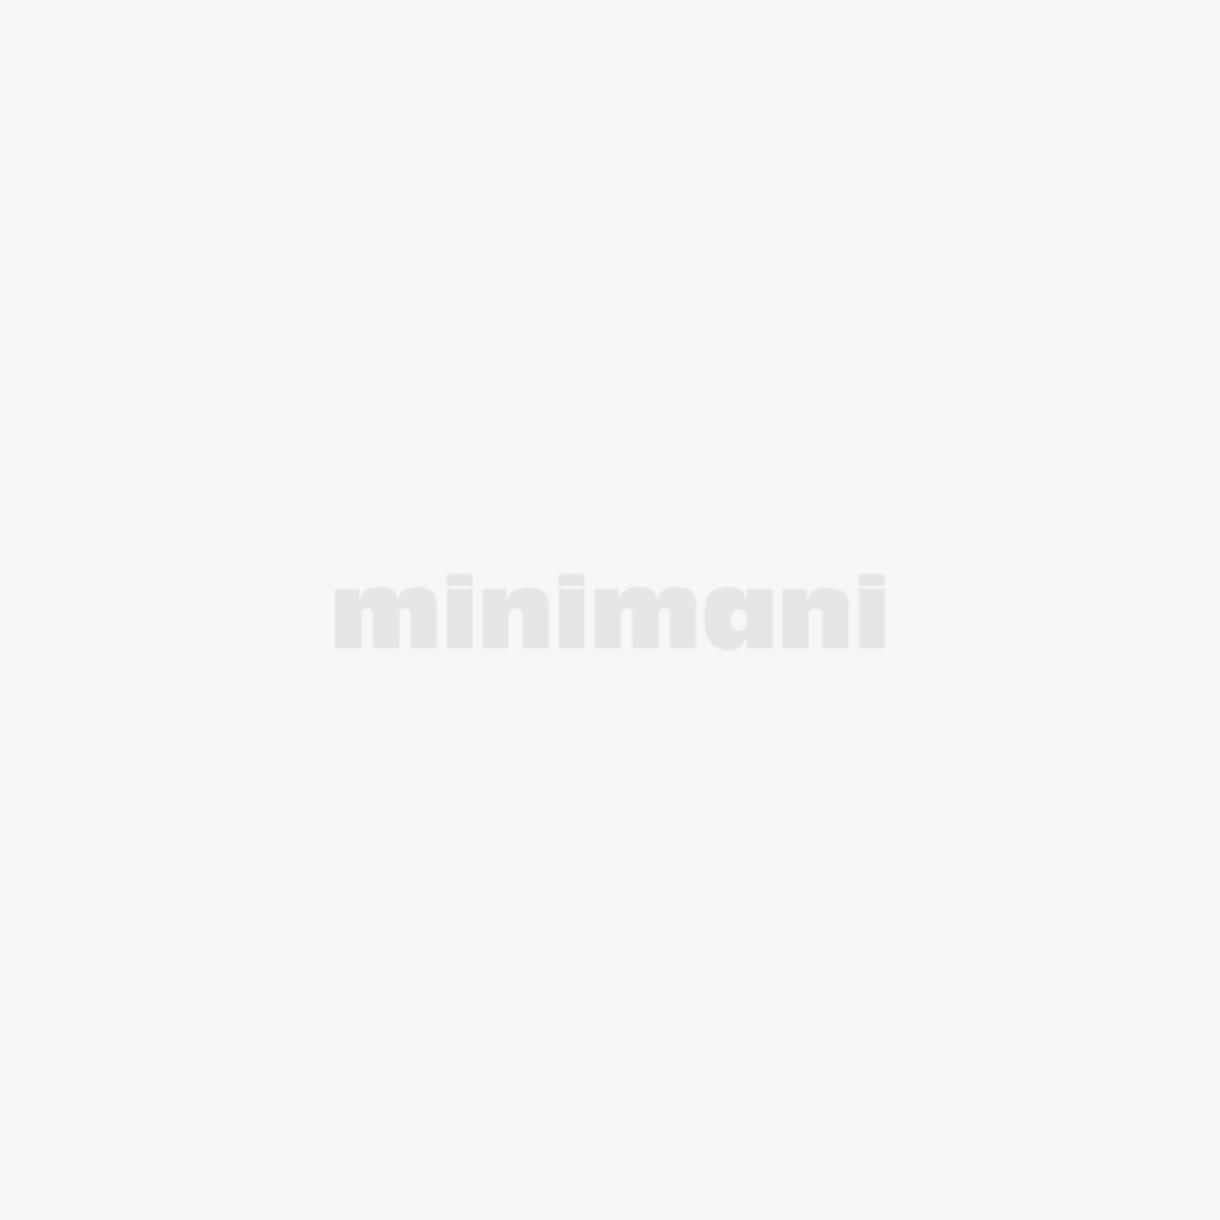 Vallila matto 50x80cm, Jaffa vaaleanharmaa